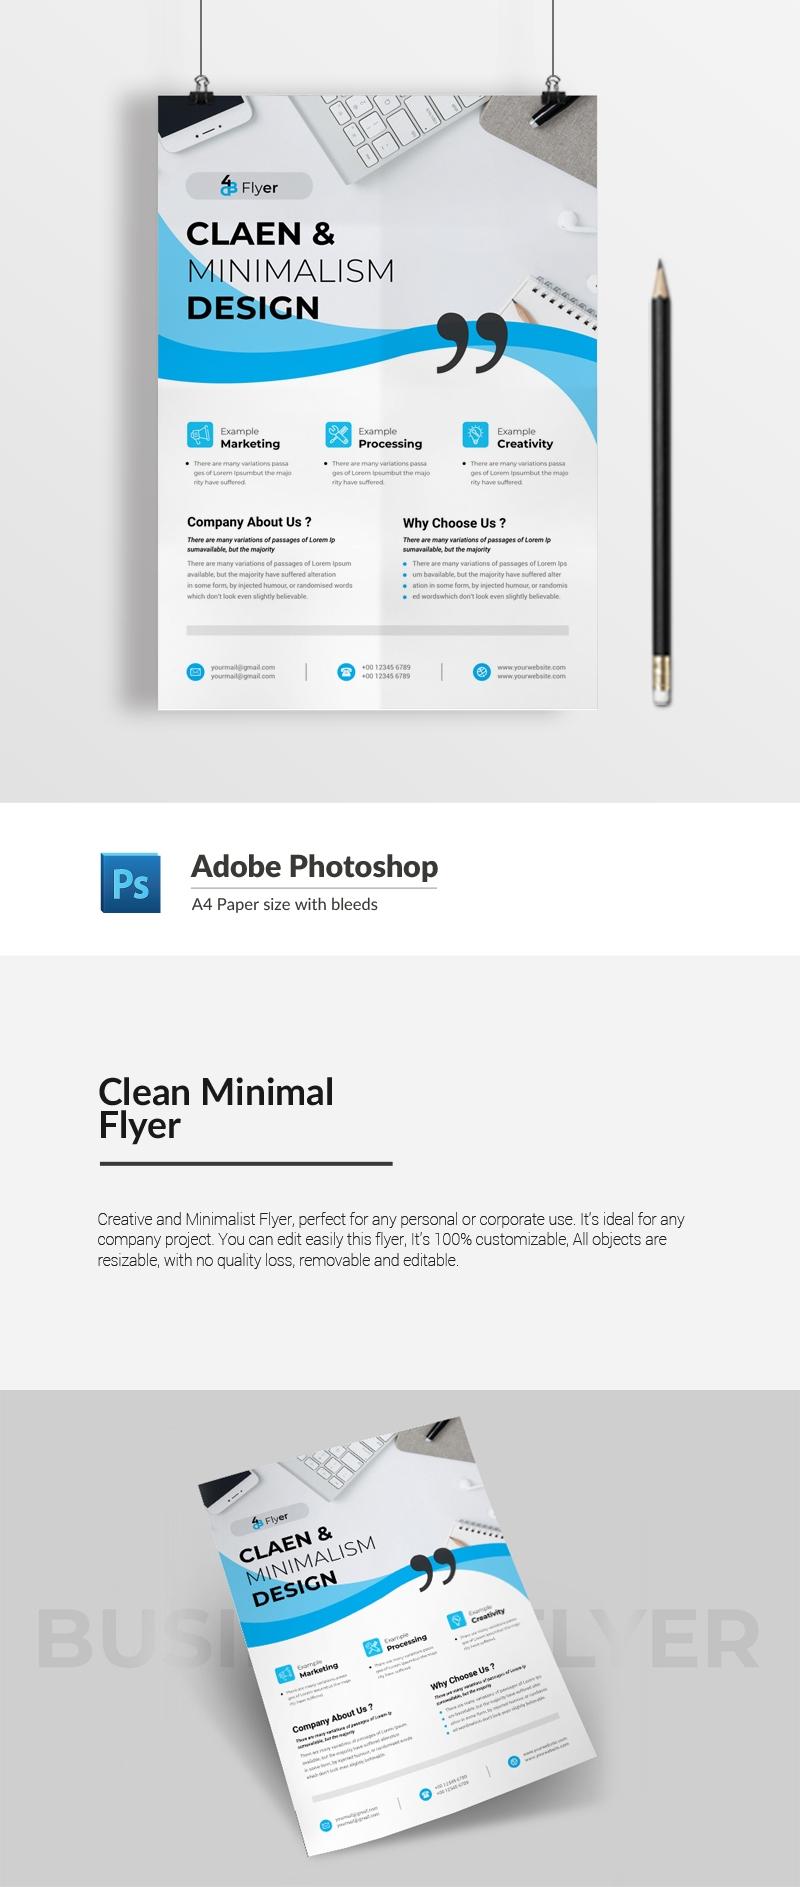 Clean Minimal Flyer